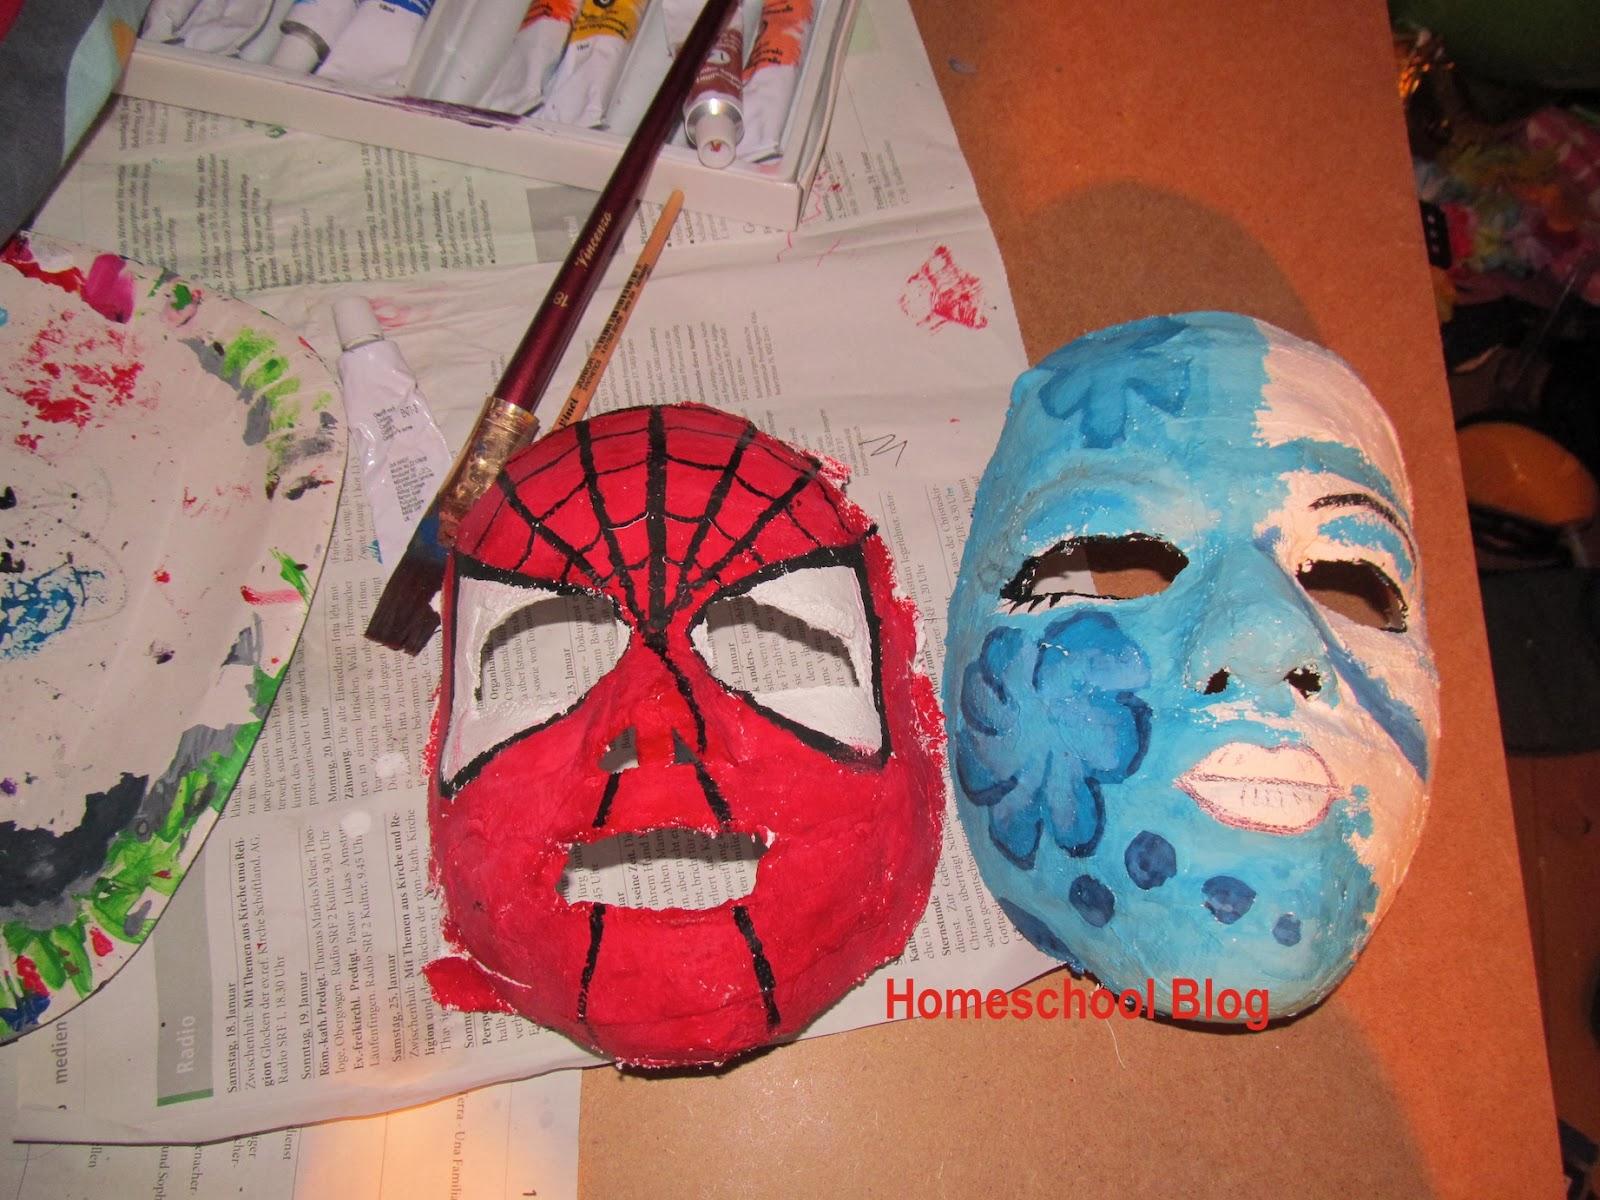 Gipsmasken-anmalen-Homeschool-Blog-Bernice-Jan-Zieba